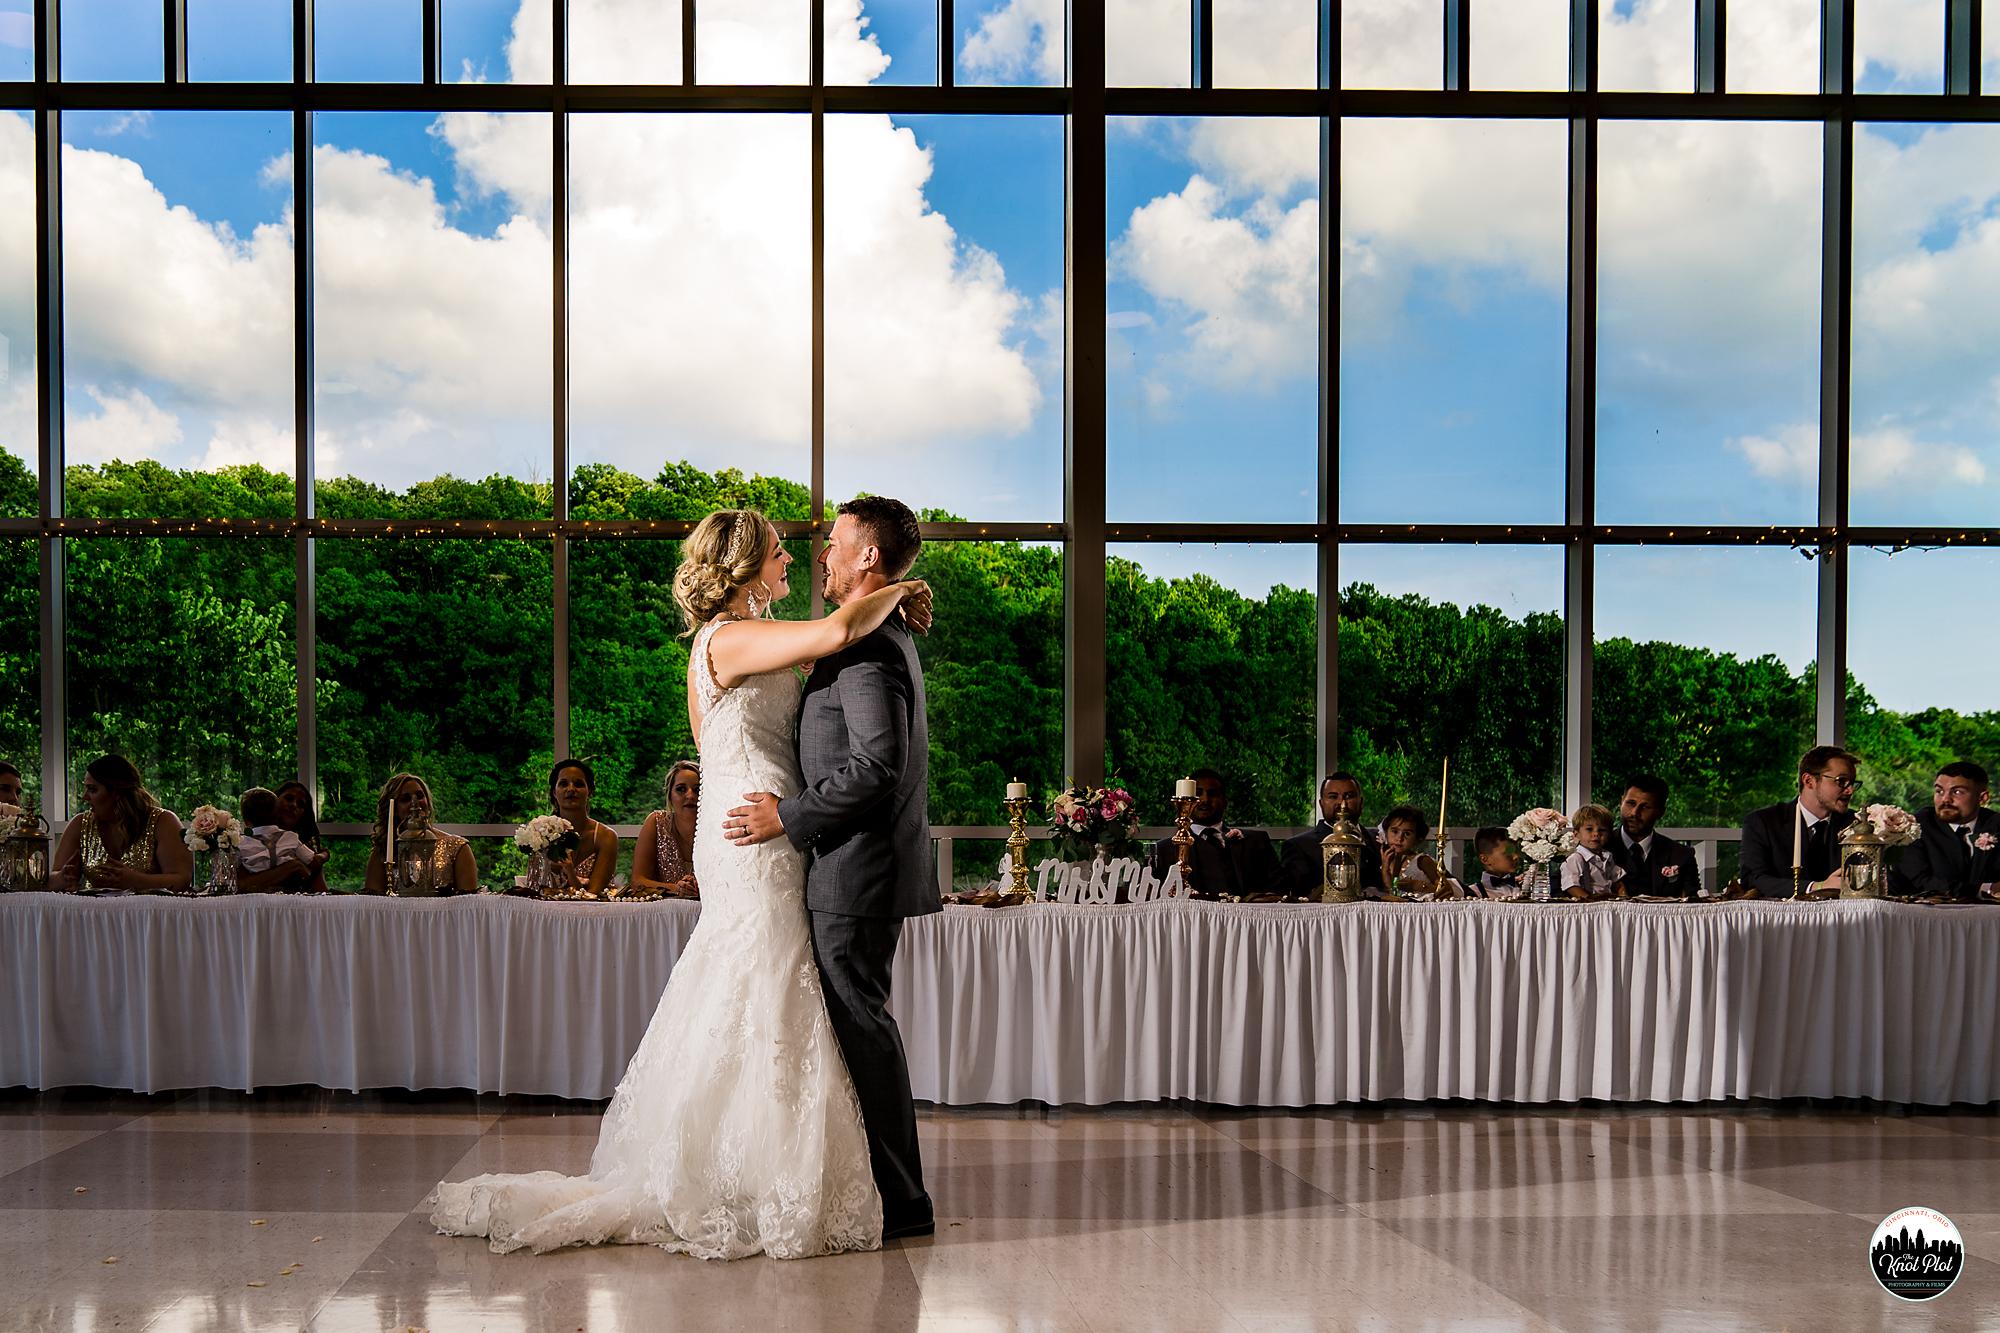 Southgate-Community-Center-KY-Wedding-Photography-22.jpg